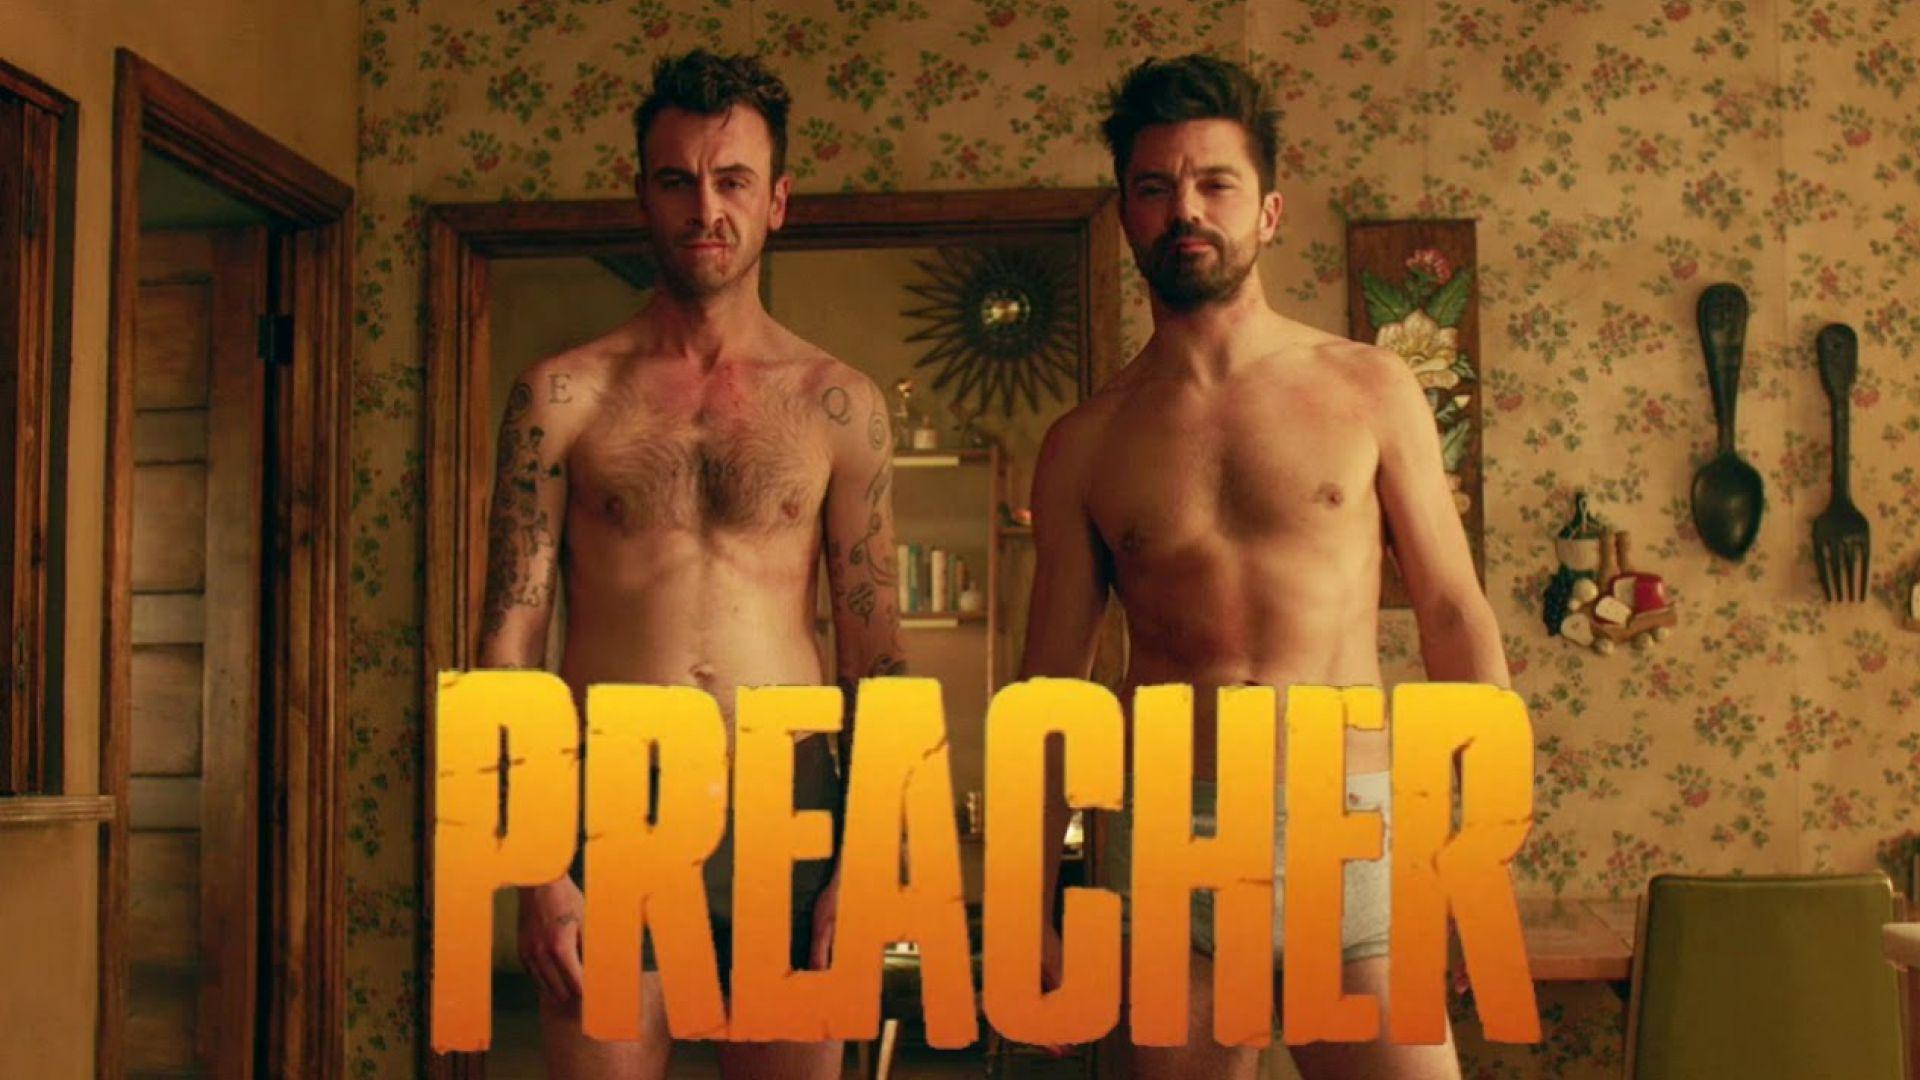 Preacher naked